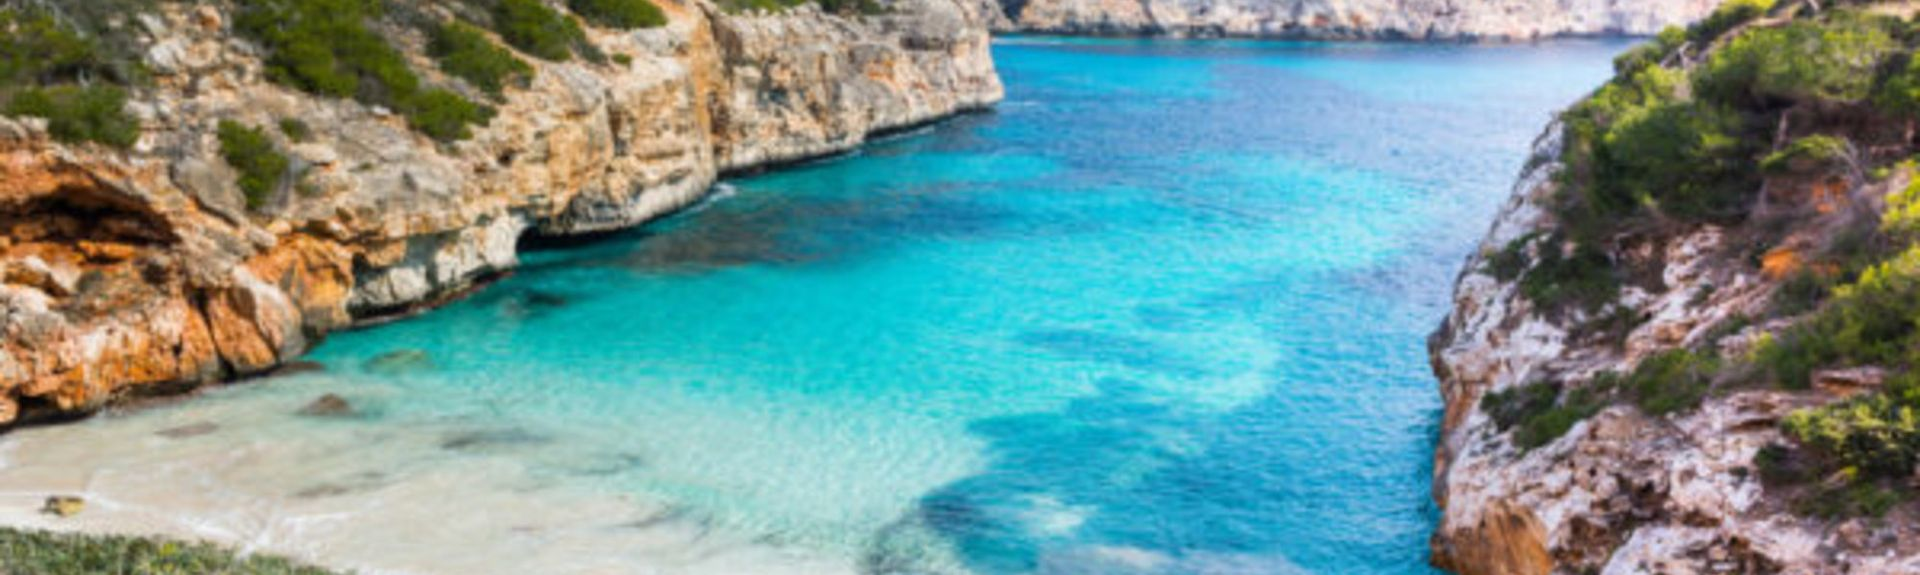 Inca, Balearic Islands, Spain